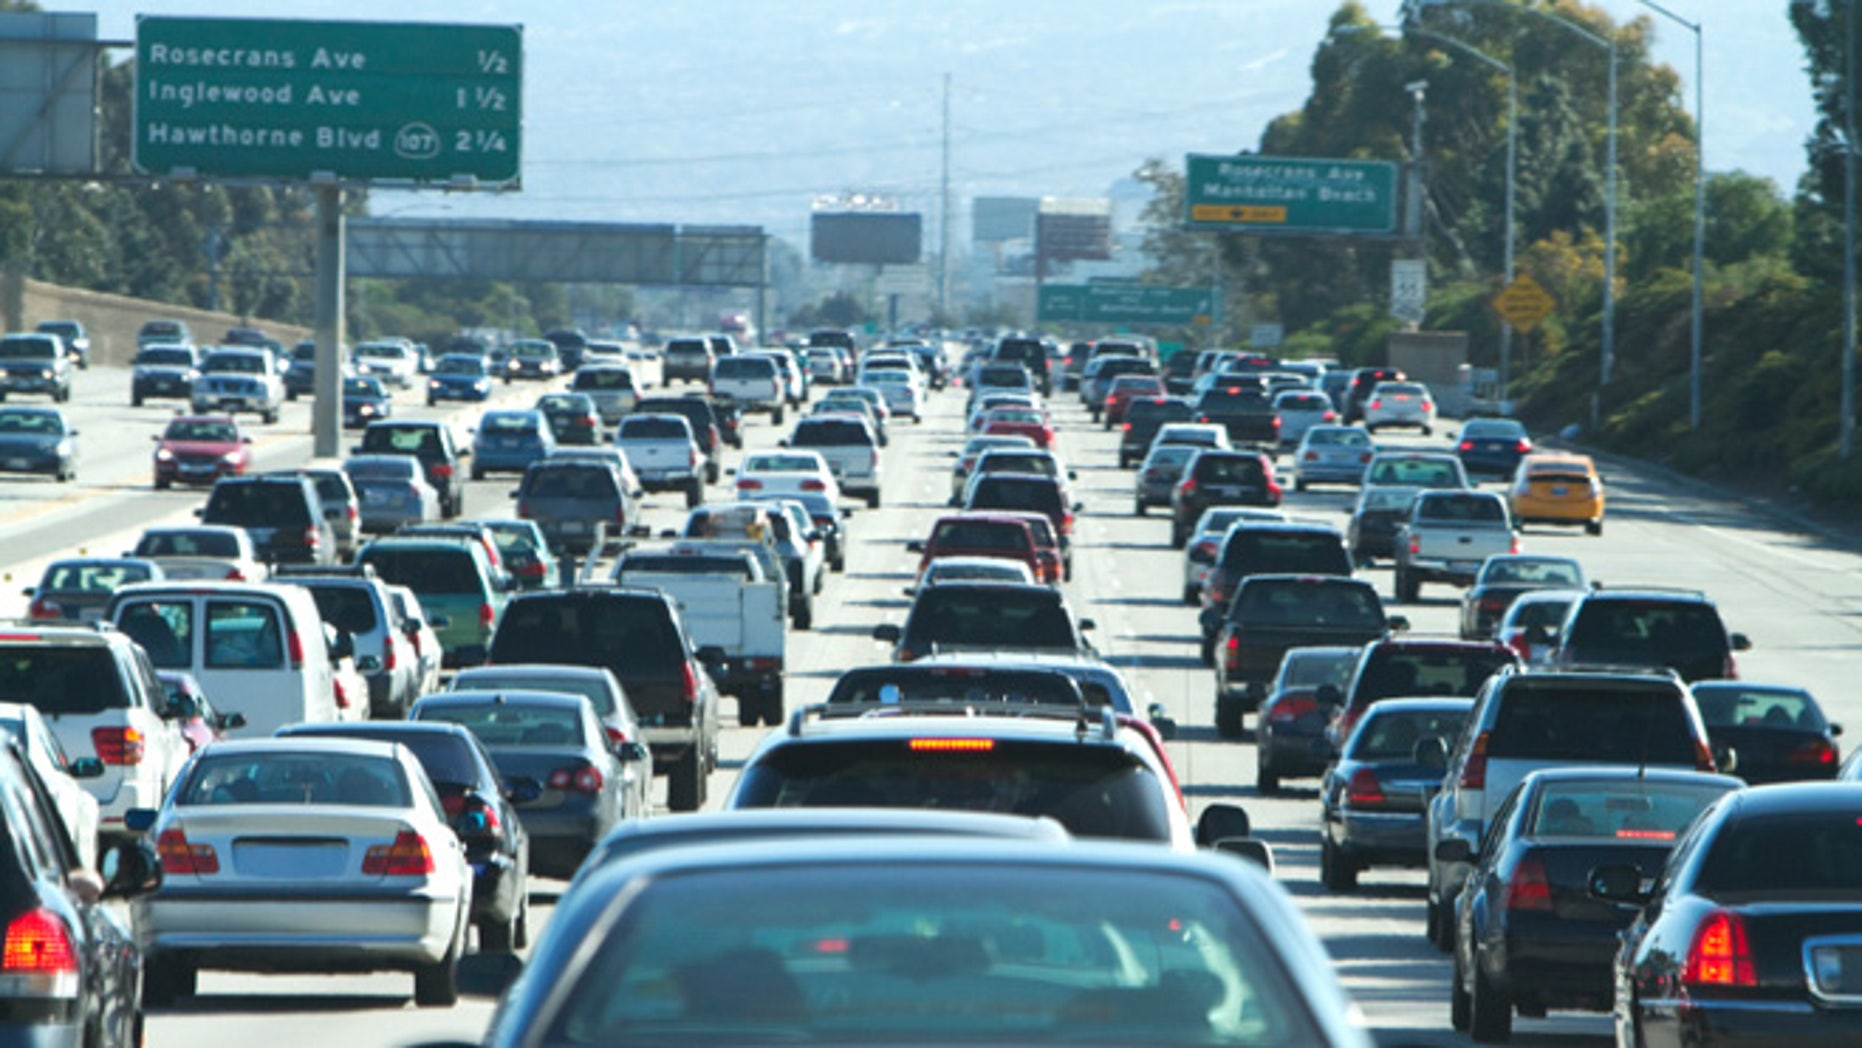 Traffic on LA's 405 freeway